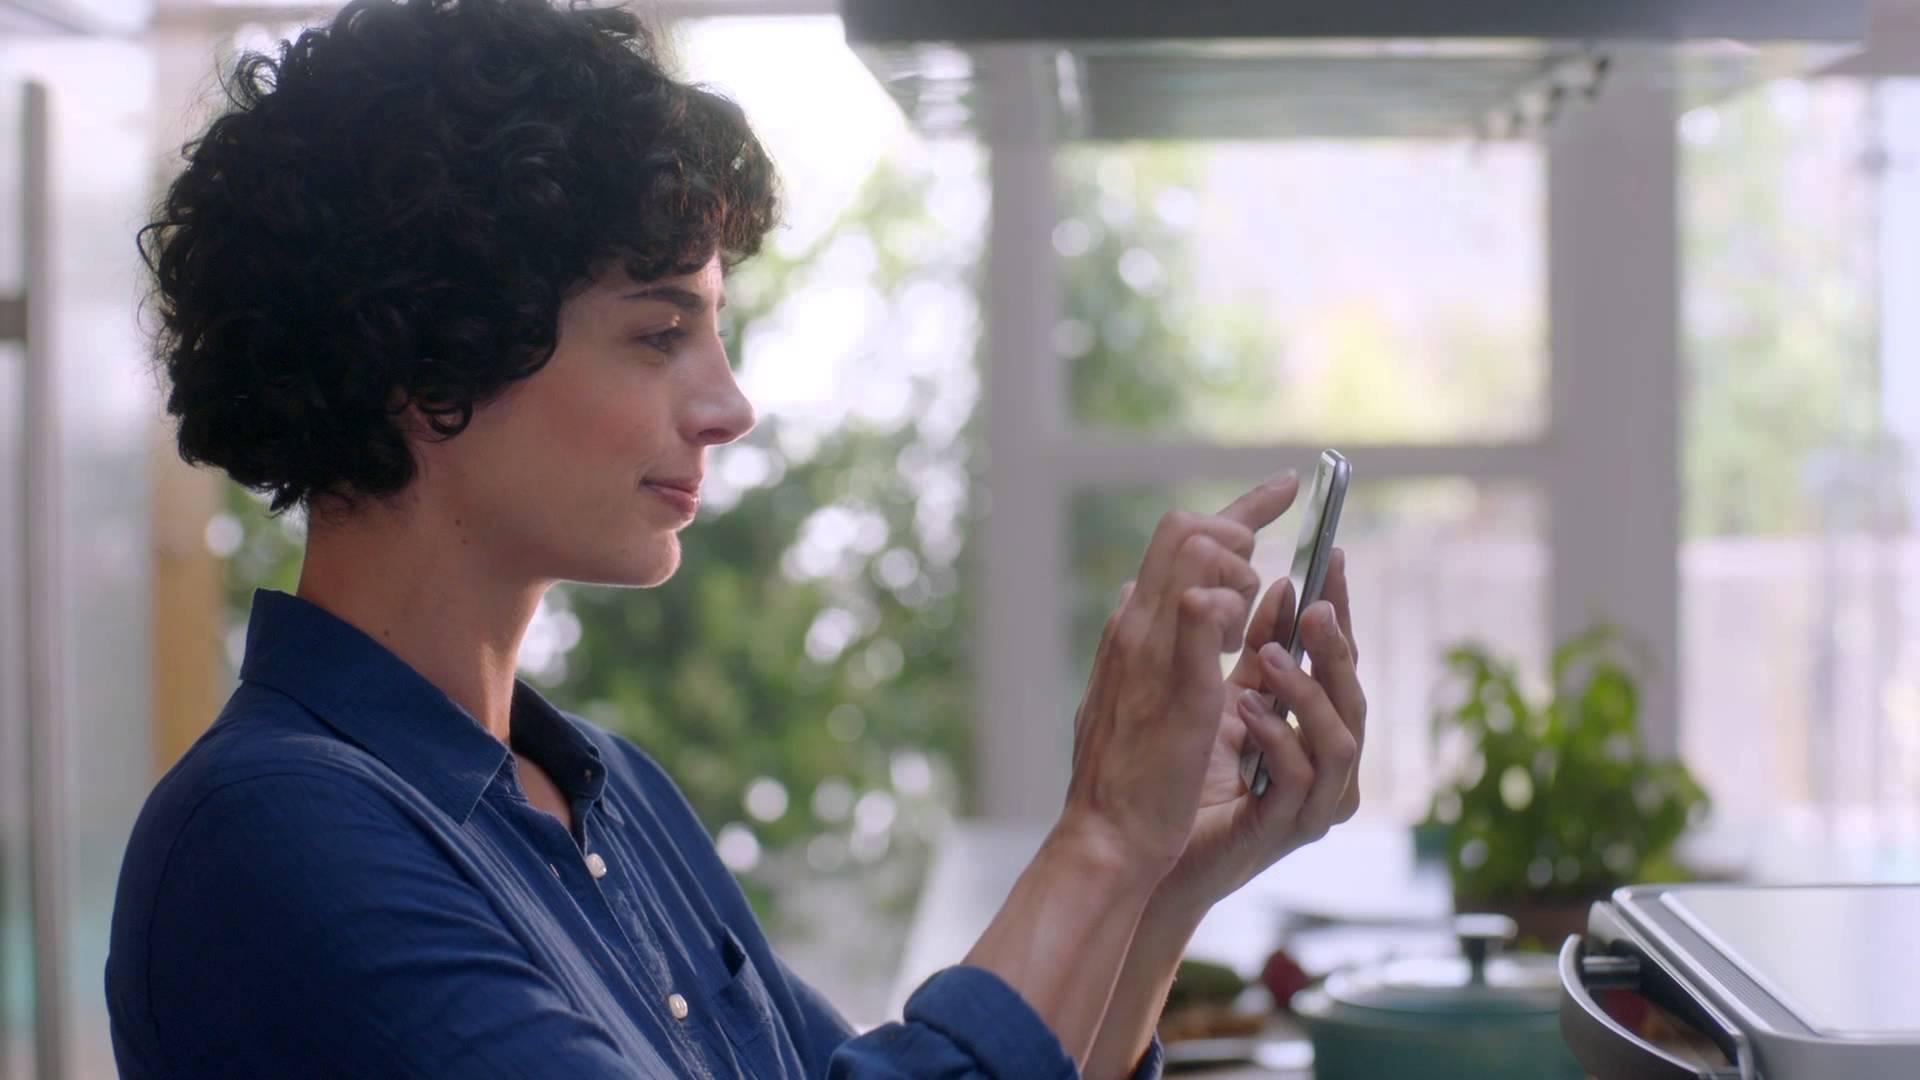 「June 智慧型烤箱,五星級料理在家輕鬆做!」- June Intelligent Oven